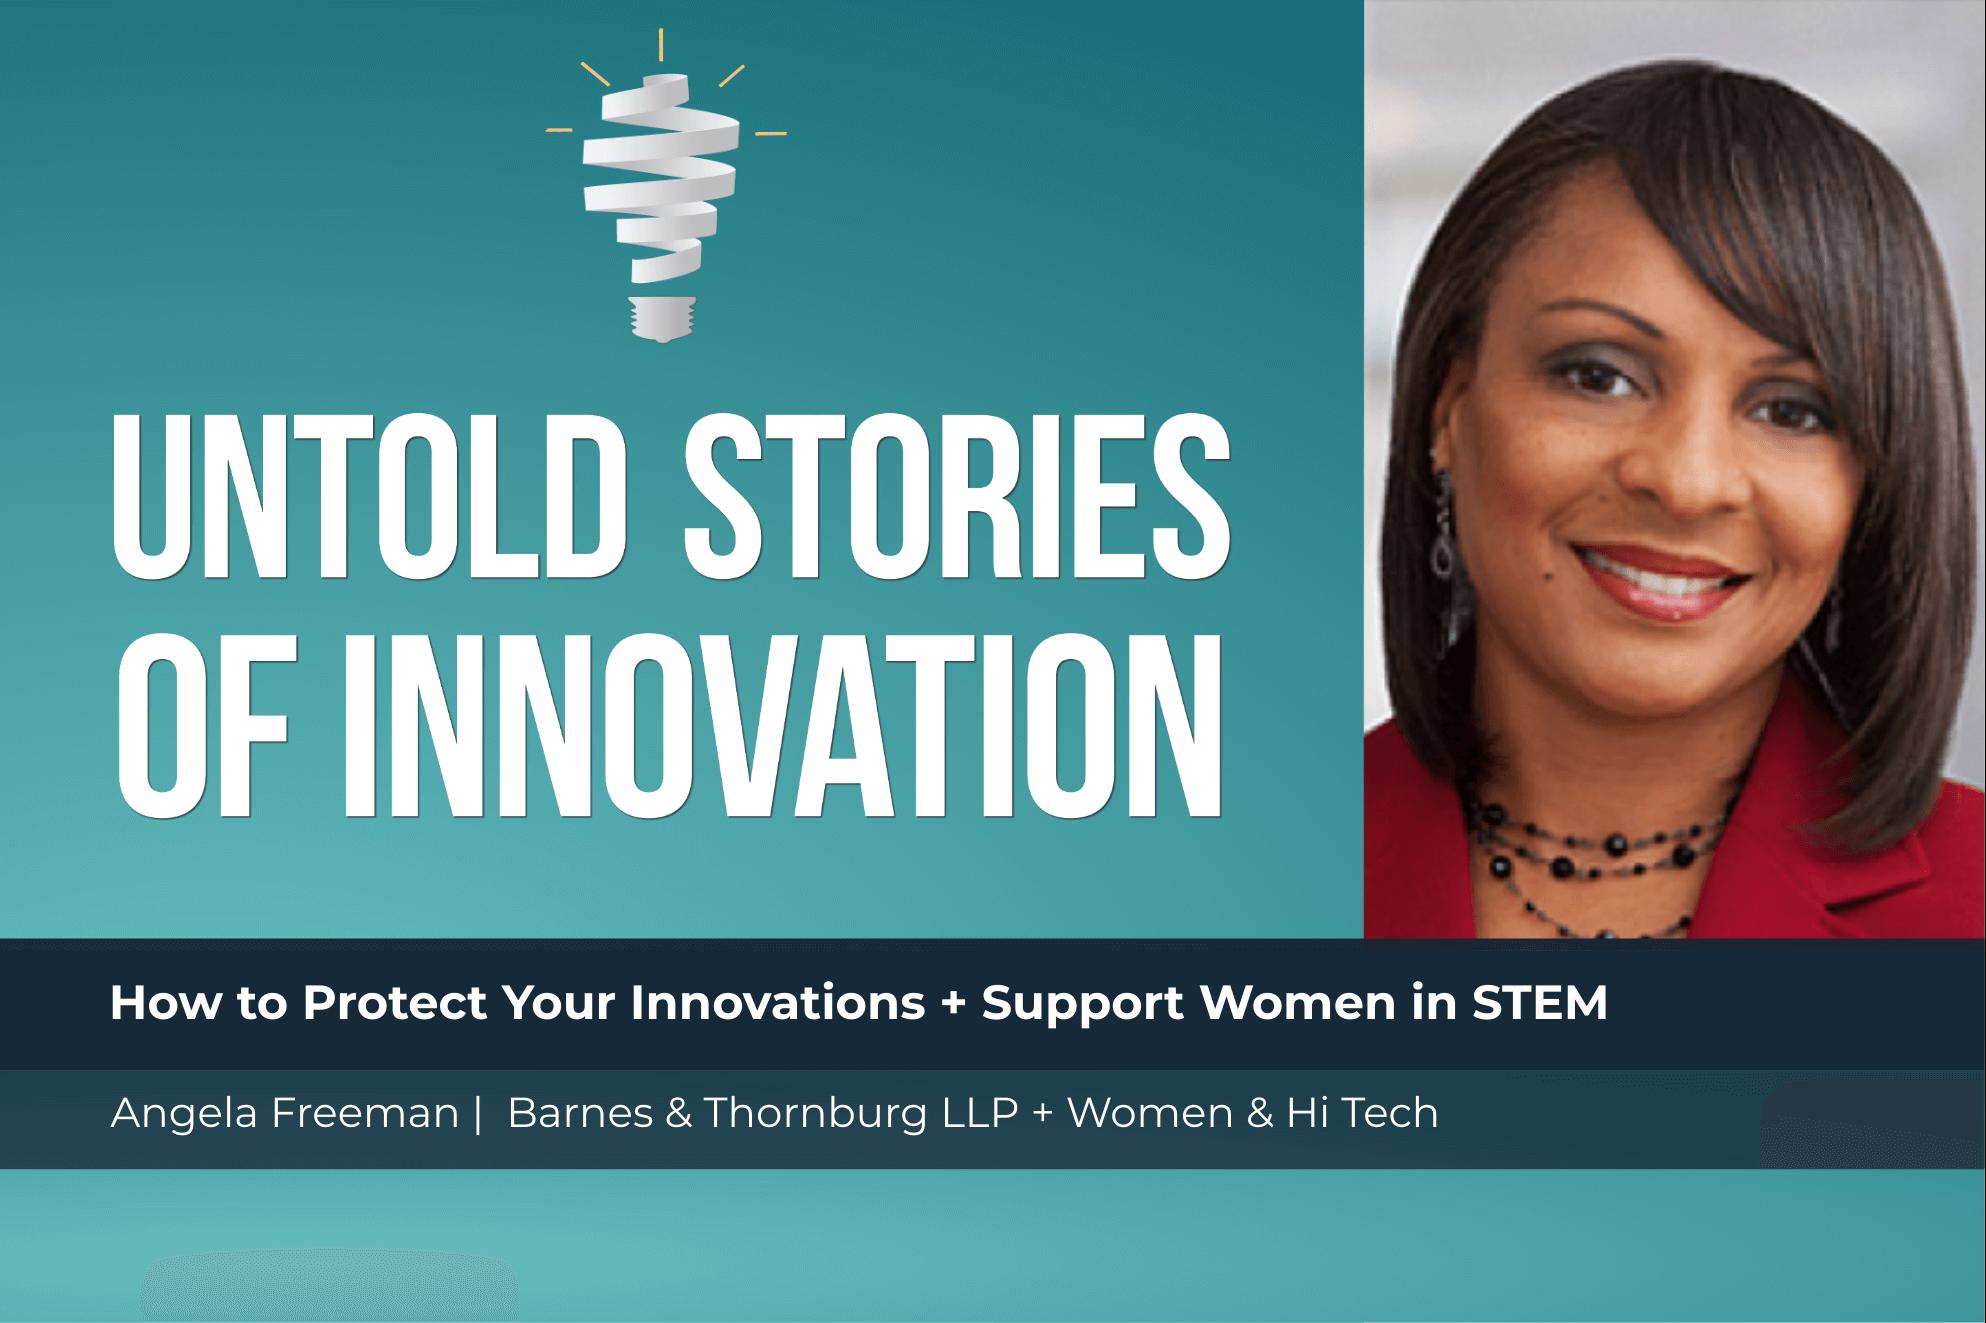 Support women in STEM